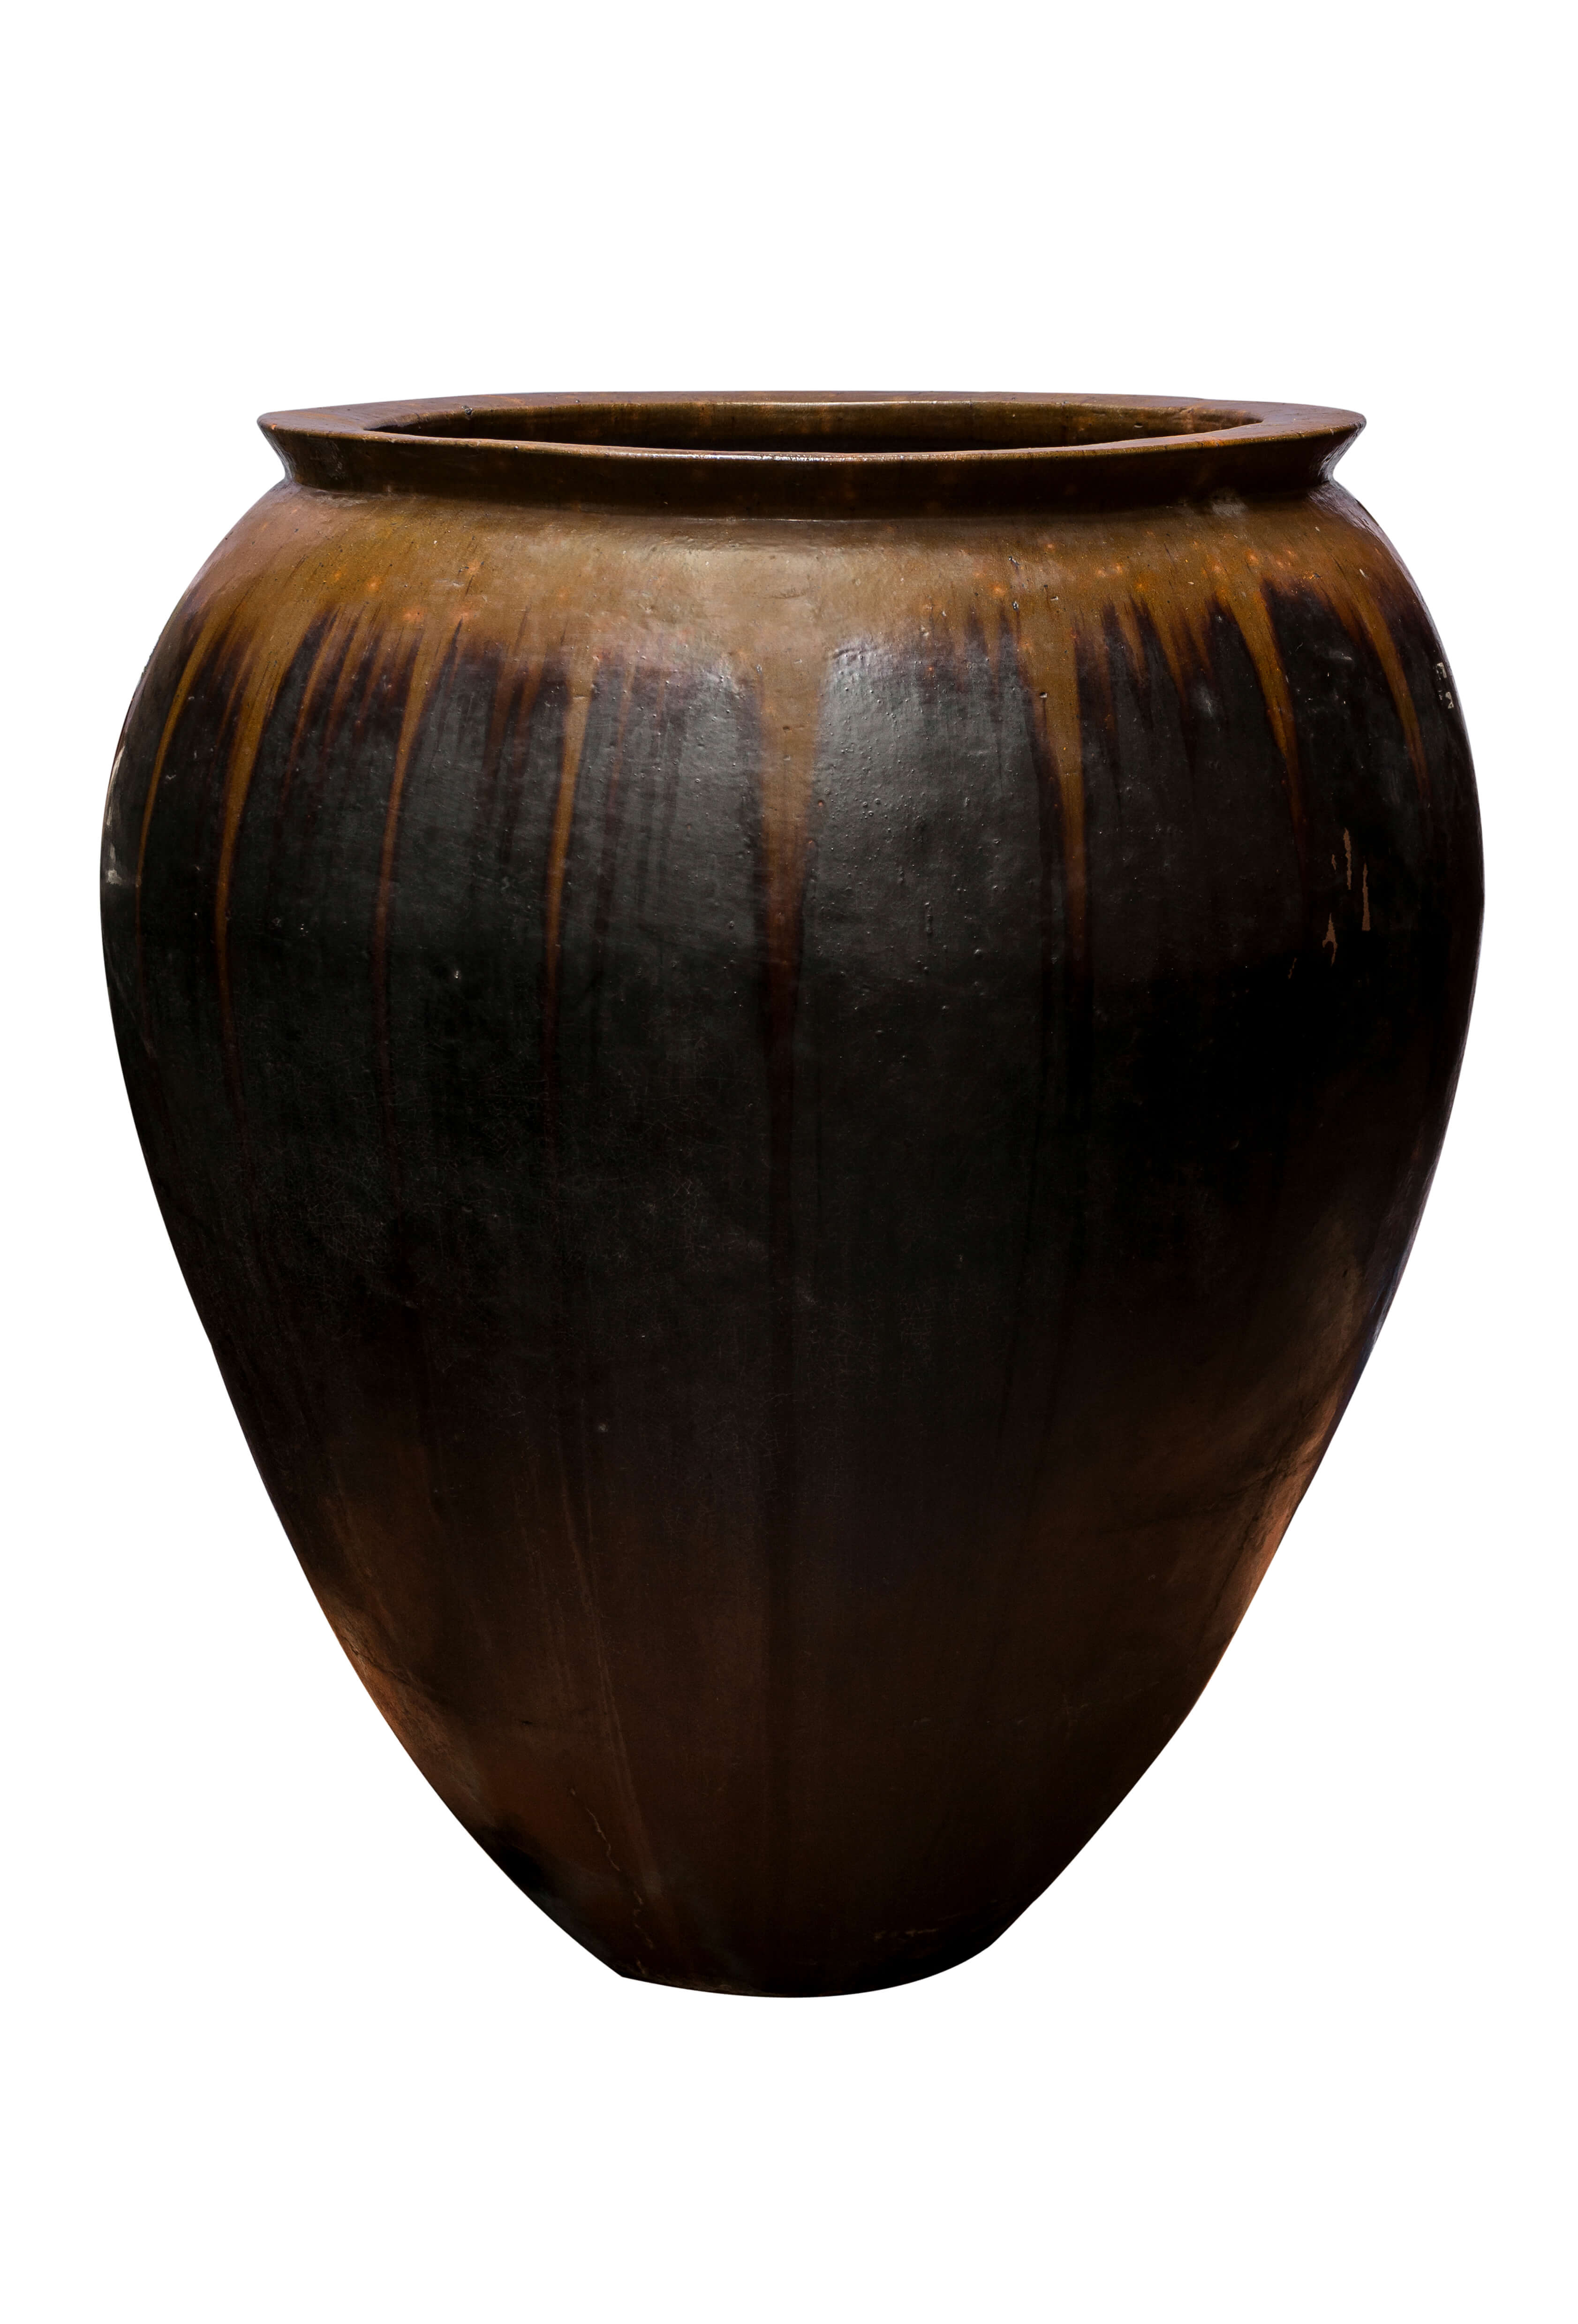 Balinese black earthenware jar